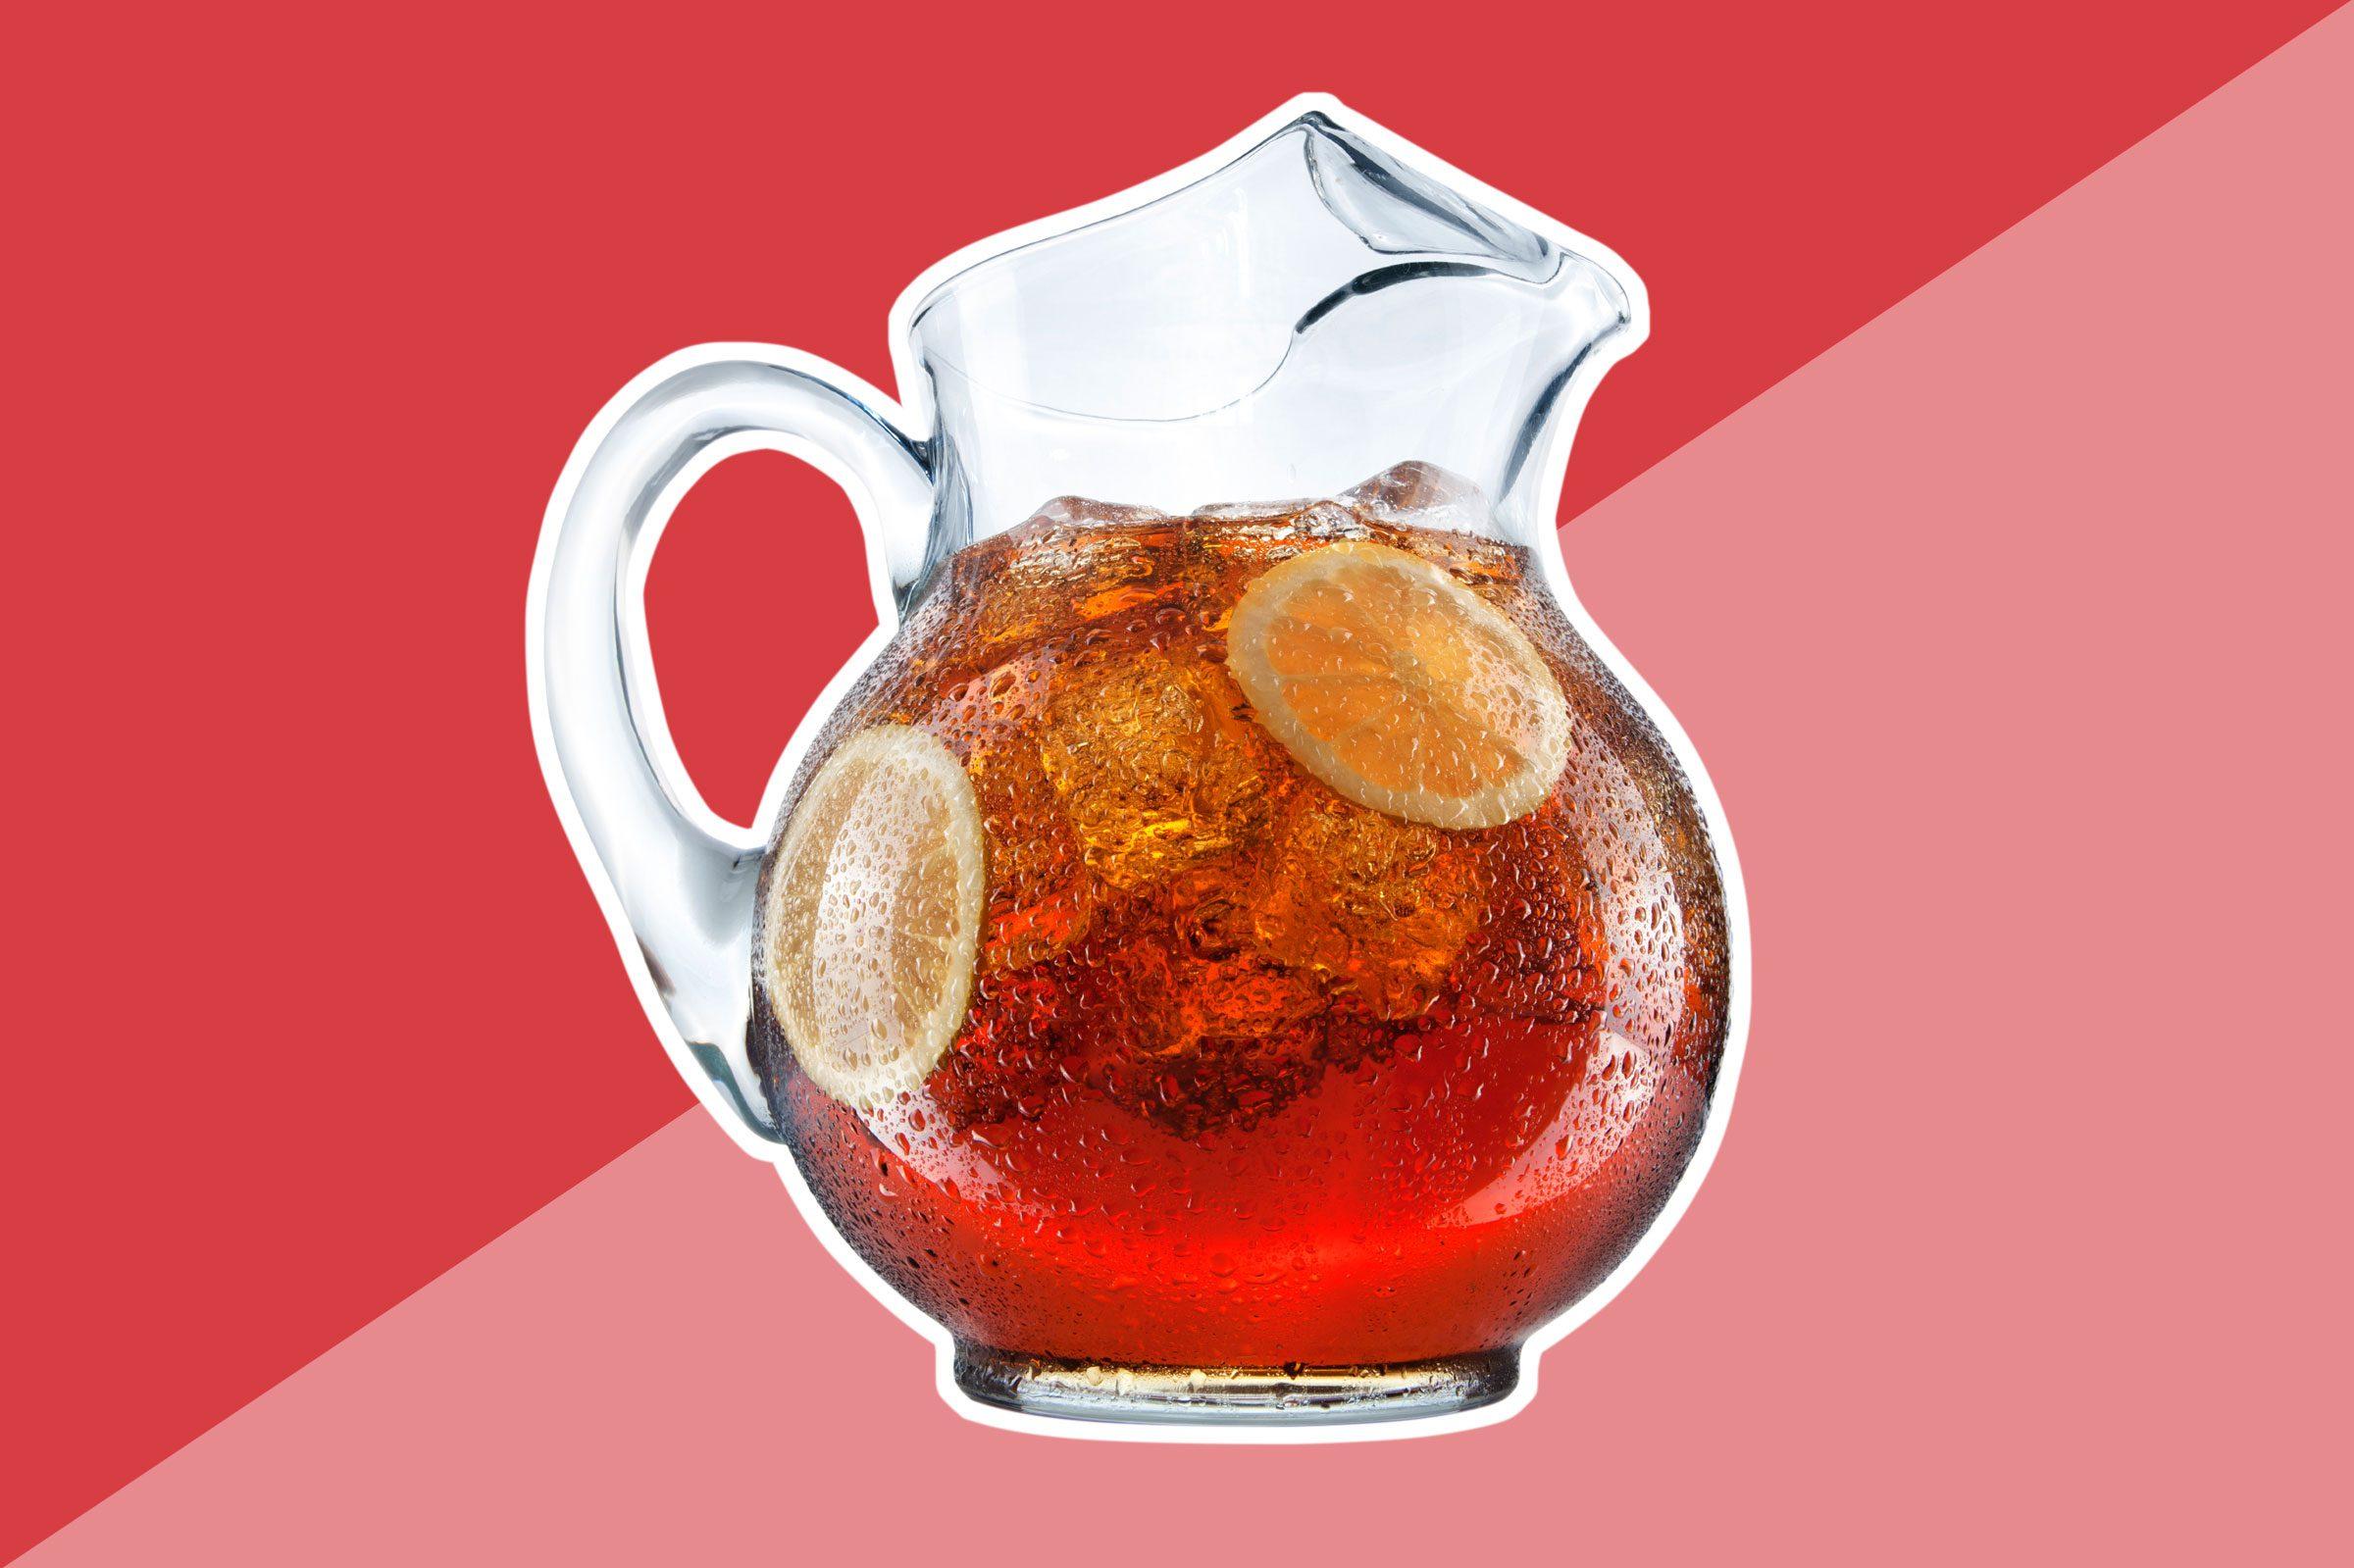 Powdered iced tea mixes or prepared flavored iced tea